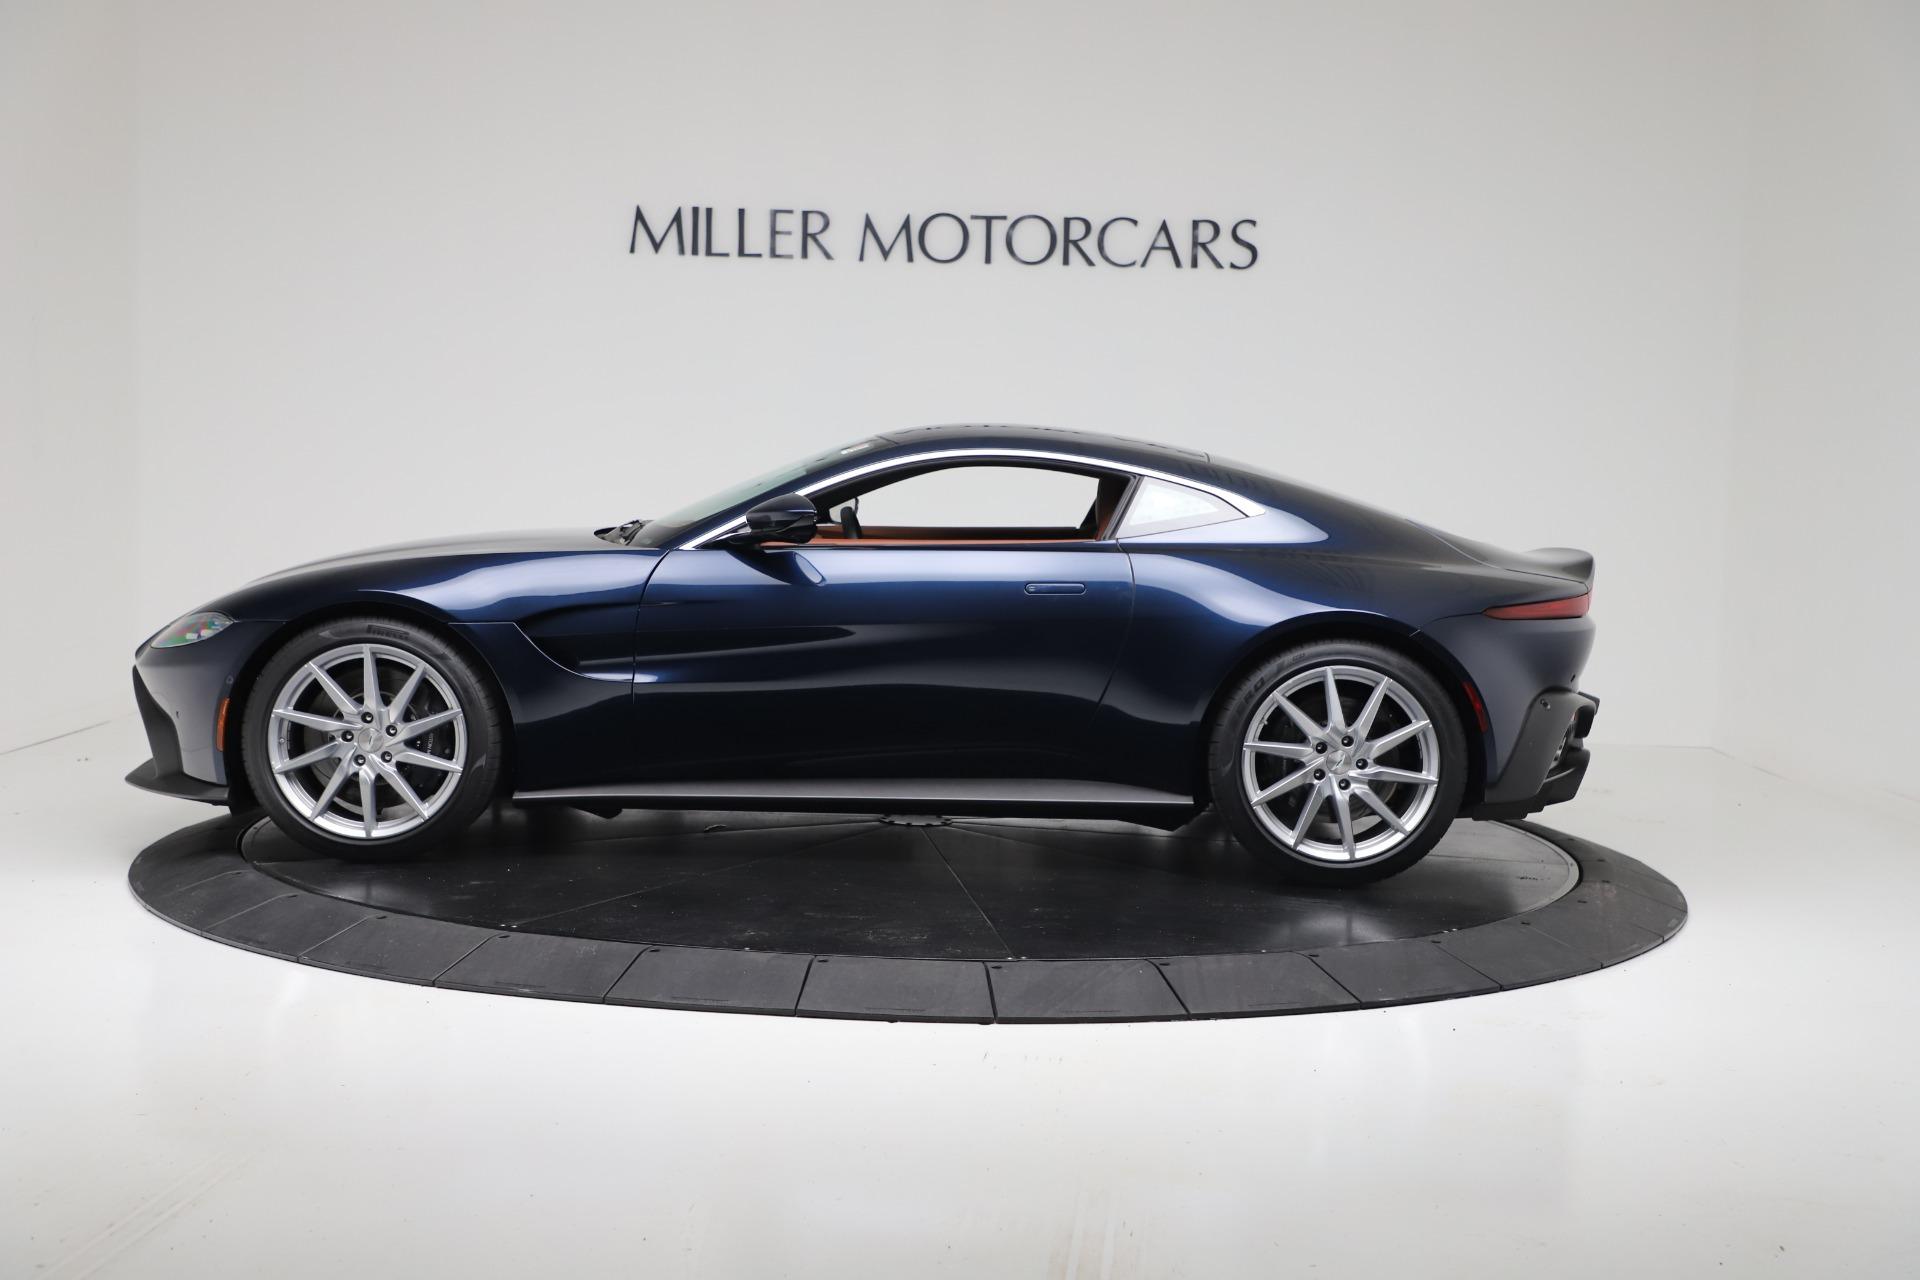 New 2020 Aston Martin Vantage V8 For Sale In Greenwich, CT 3378_p3